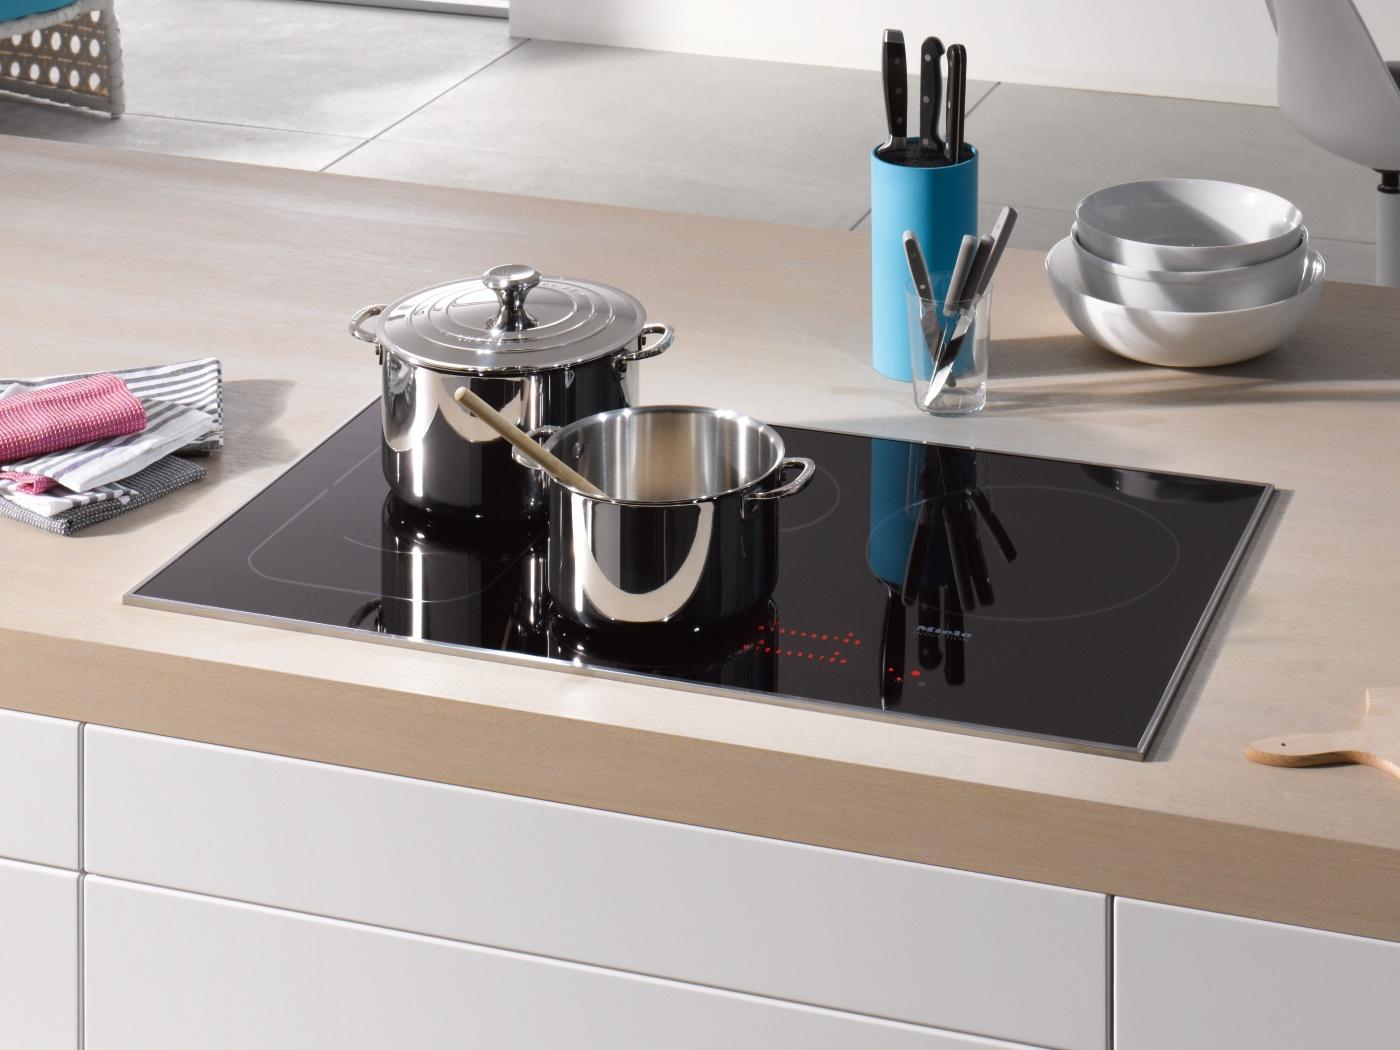 main-cooktop-induction.jpg